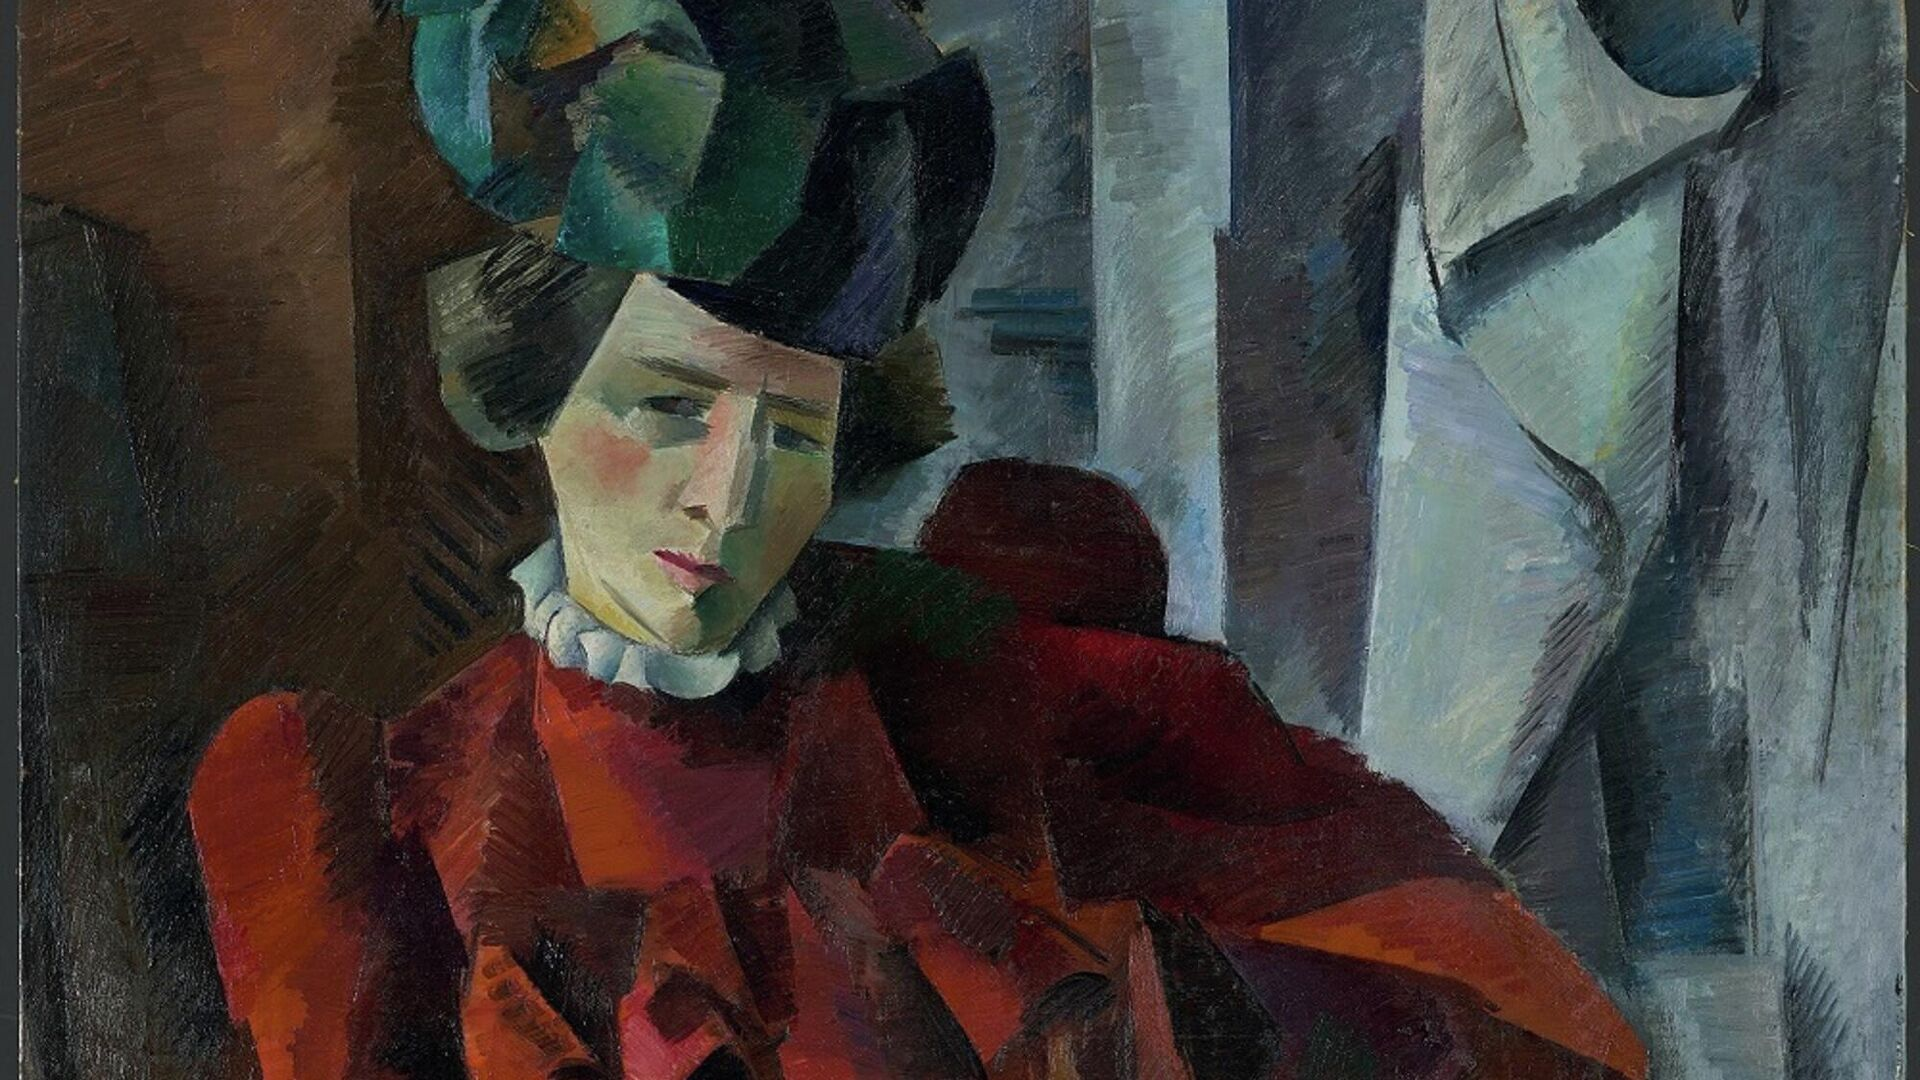 "1590603437 0:252:2000:1377 1920x0 80 0 0 6f452f93928d0b23ffb0cf8cc2df3eb2 - ""Голая Валька"": выставка Роберта Фалька в Третьяковской галерее"